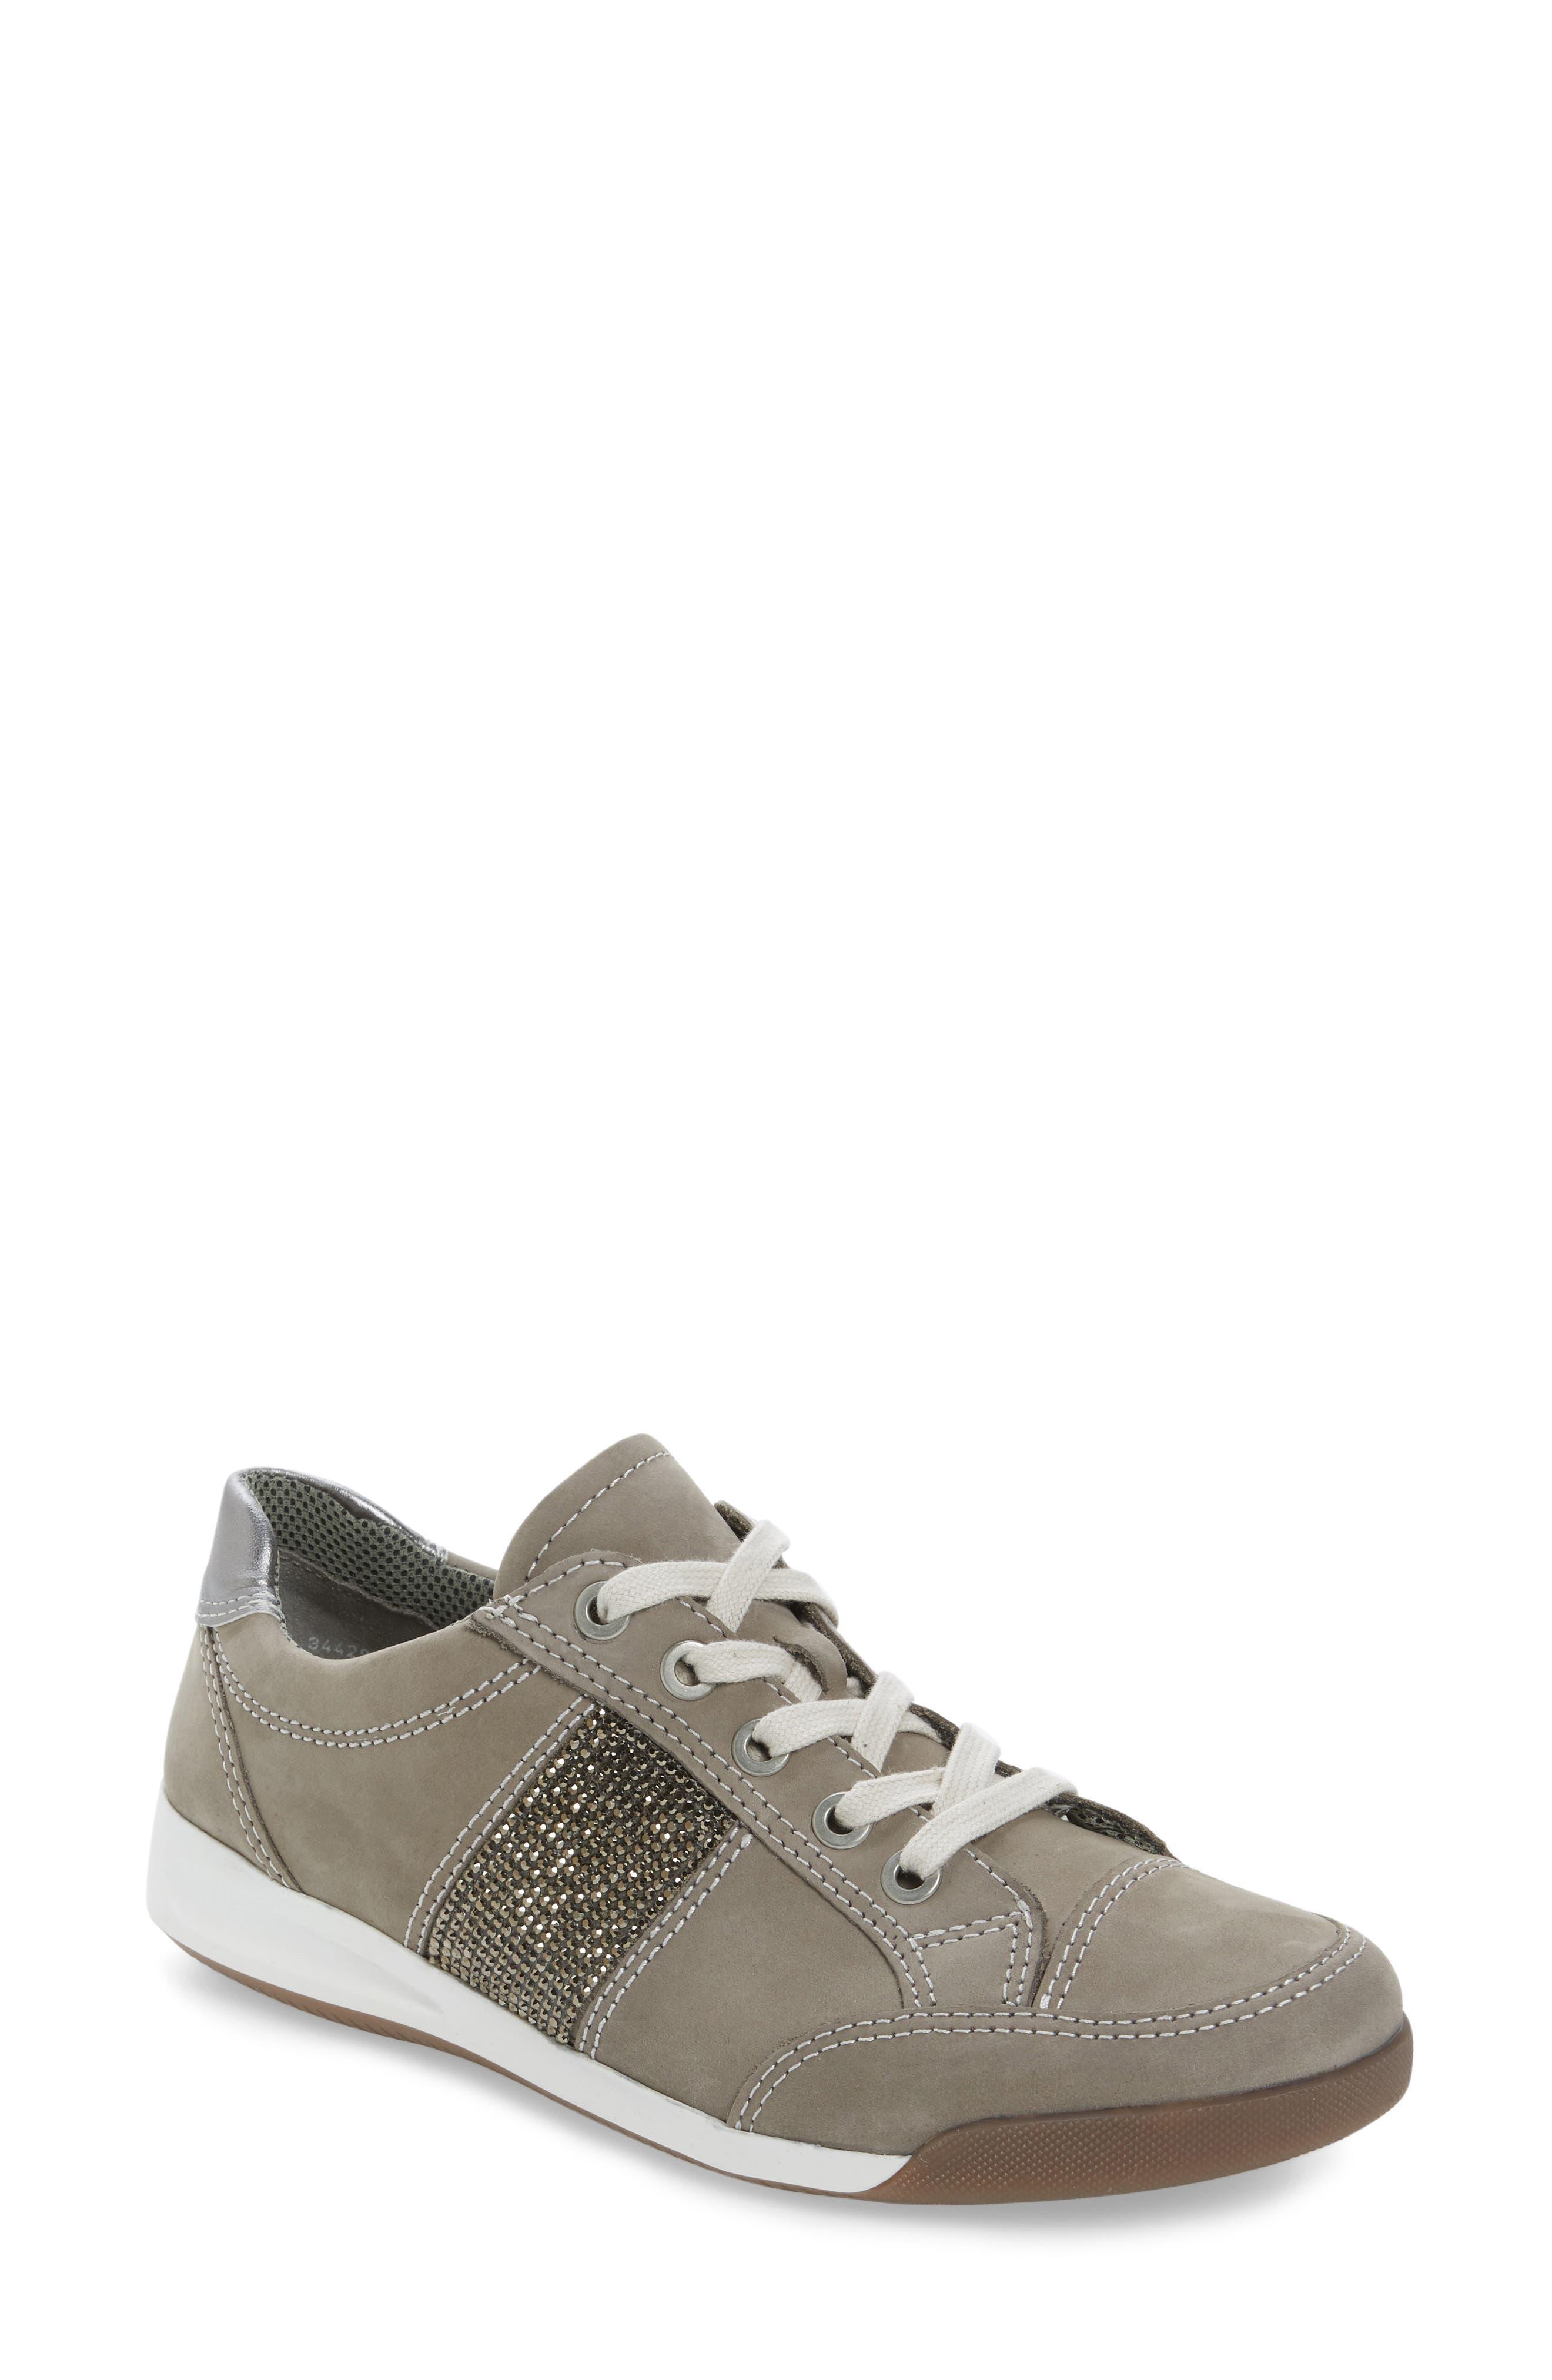 Rickie Sneaker,                             Main thumbnail 1, color,                             031